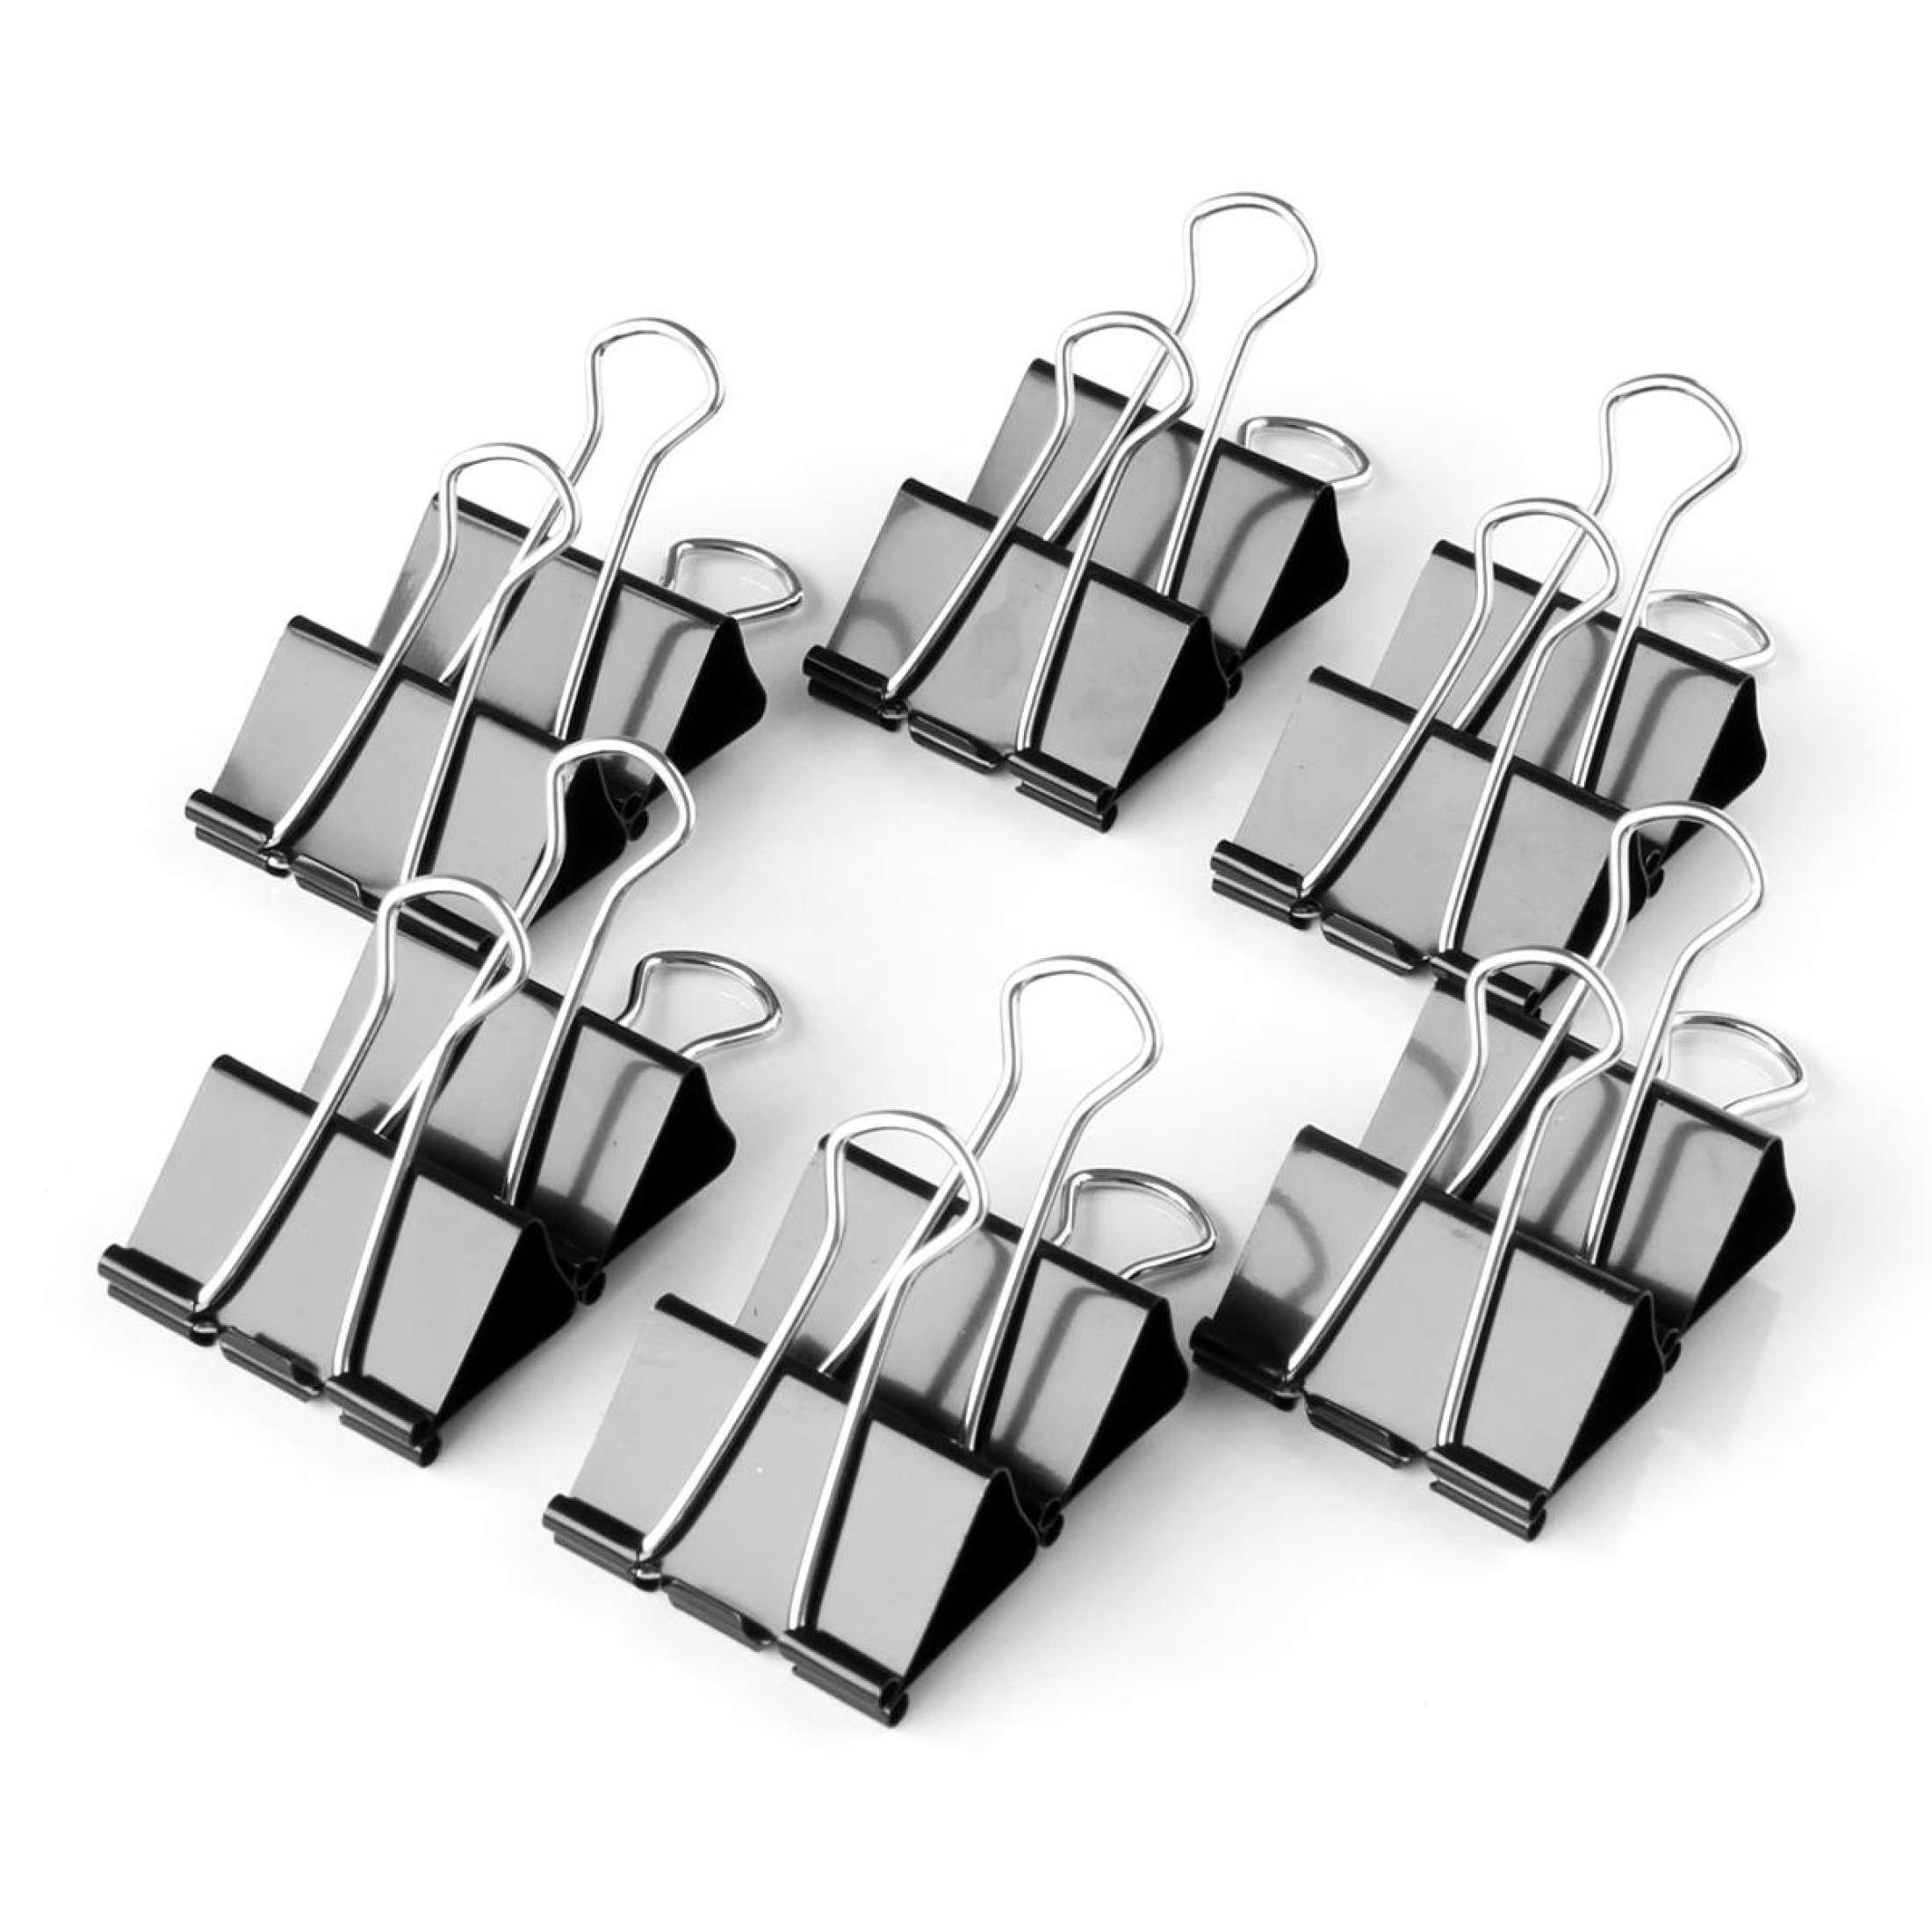 Essential Box of 12 Black Binder Clips - 51mm